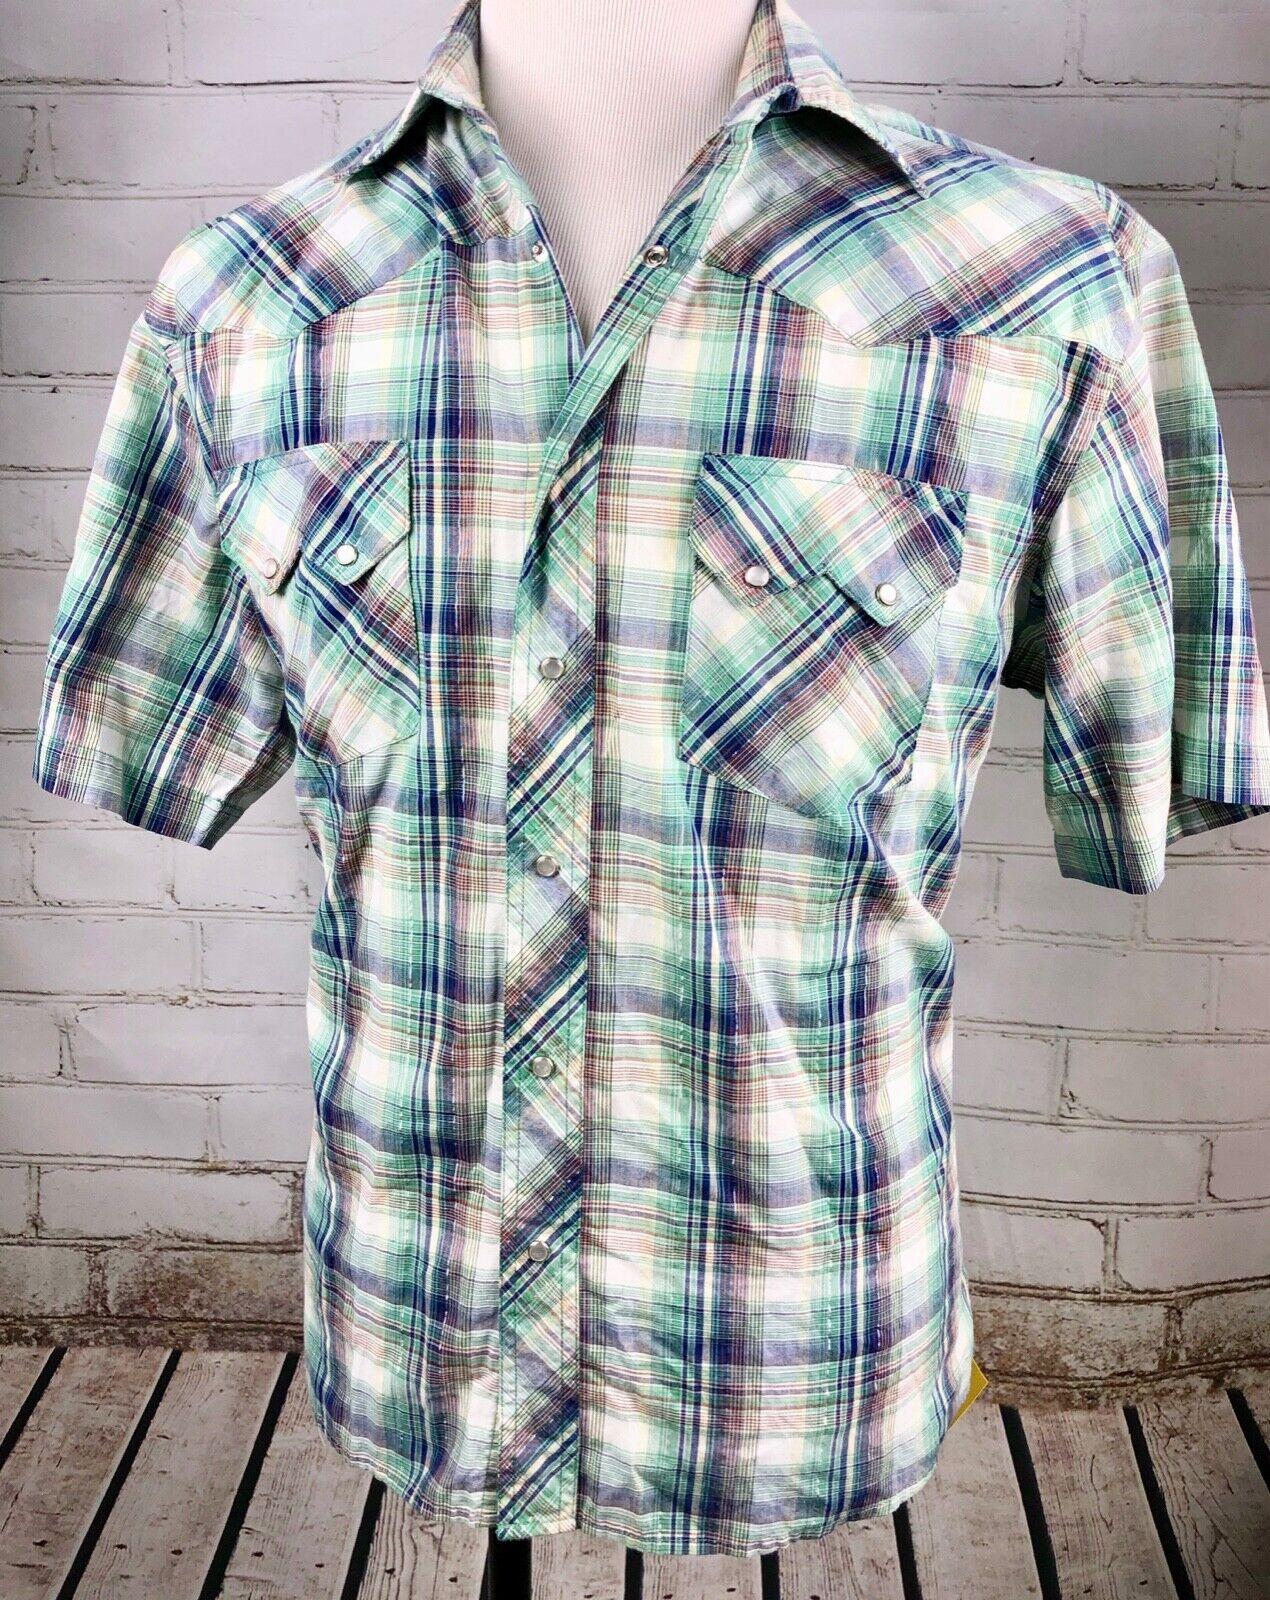 eec1d81f62 RUSTLER Plaid Shirt Western Pearl Snap Men's Vintage Short-Sleeve WRANGLER  L nzouqg2176-Casual Button-Down Shirts